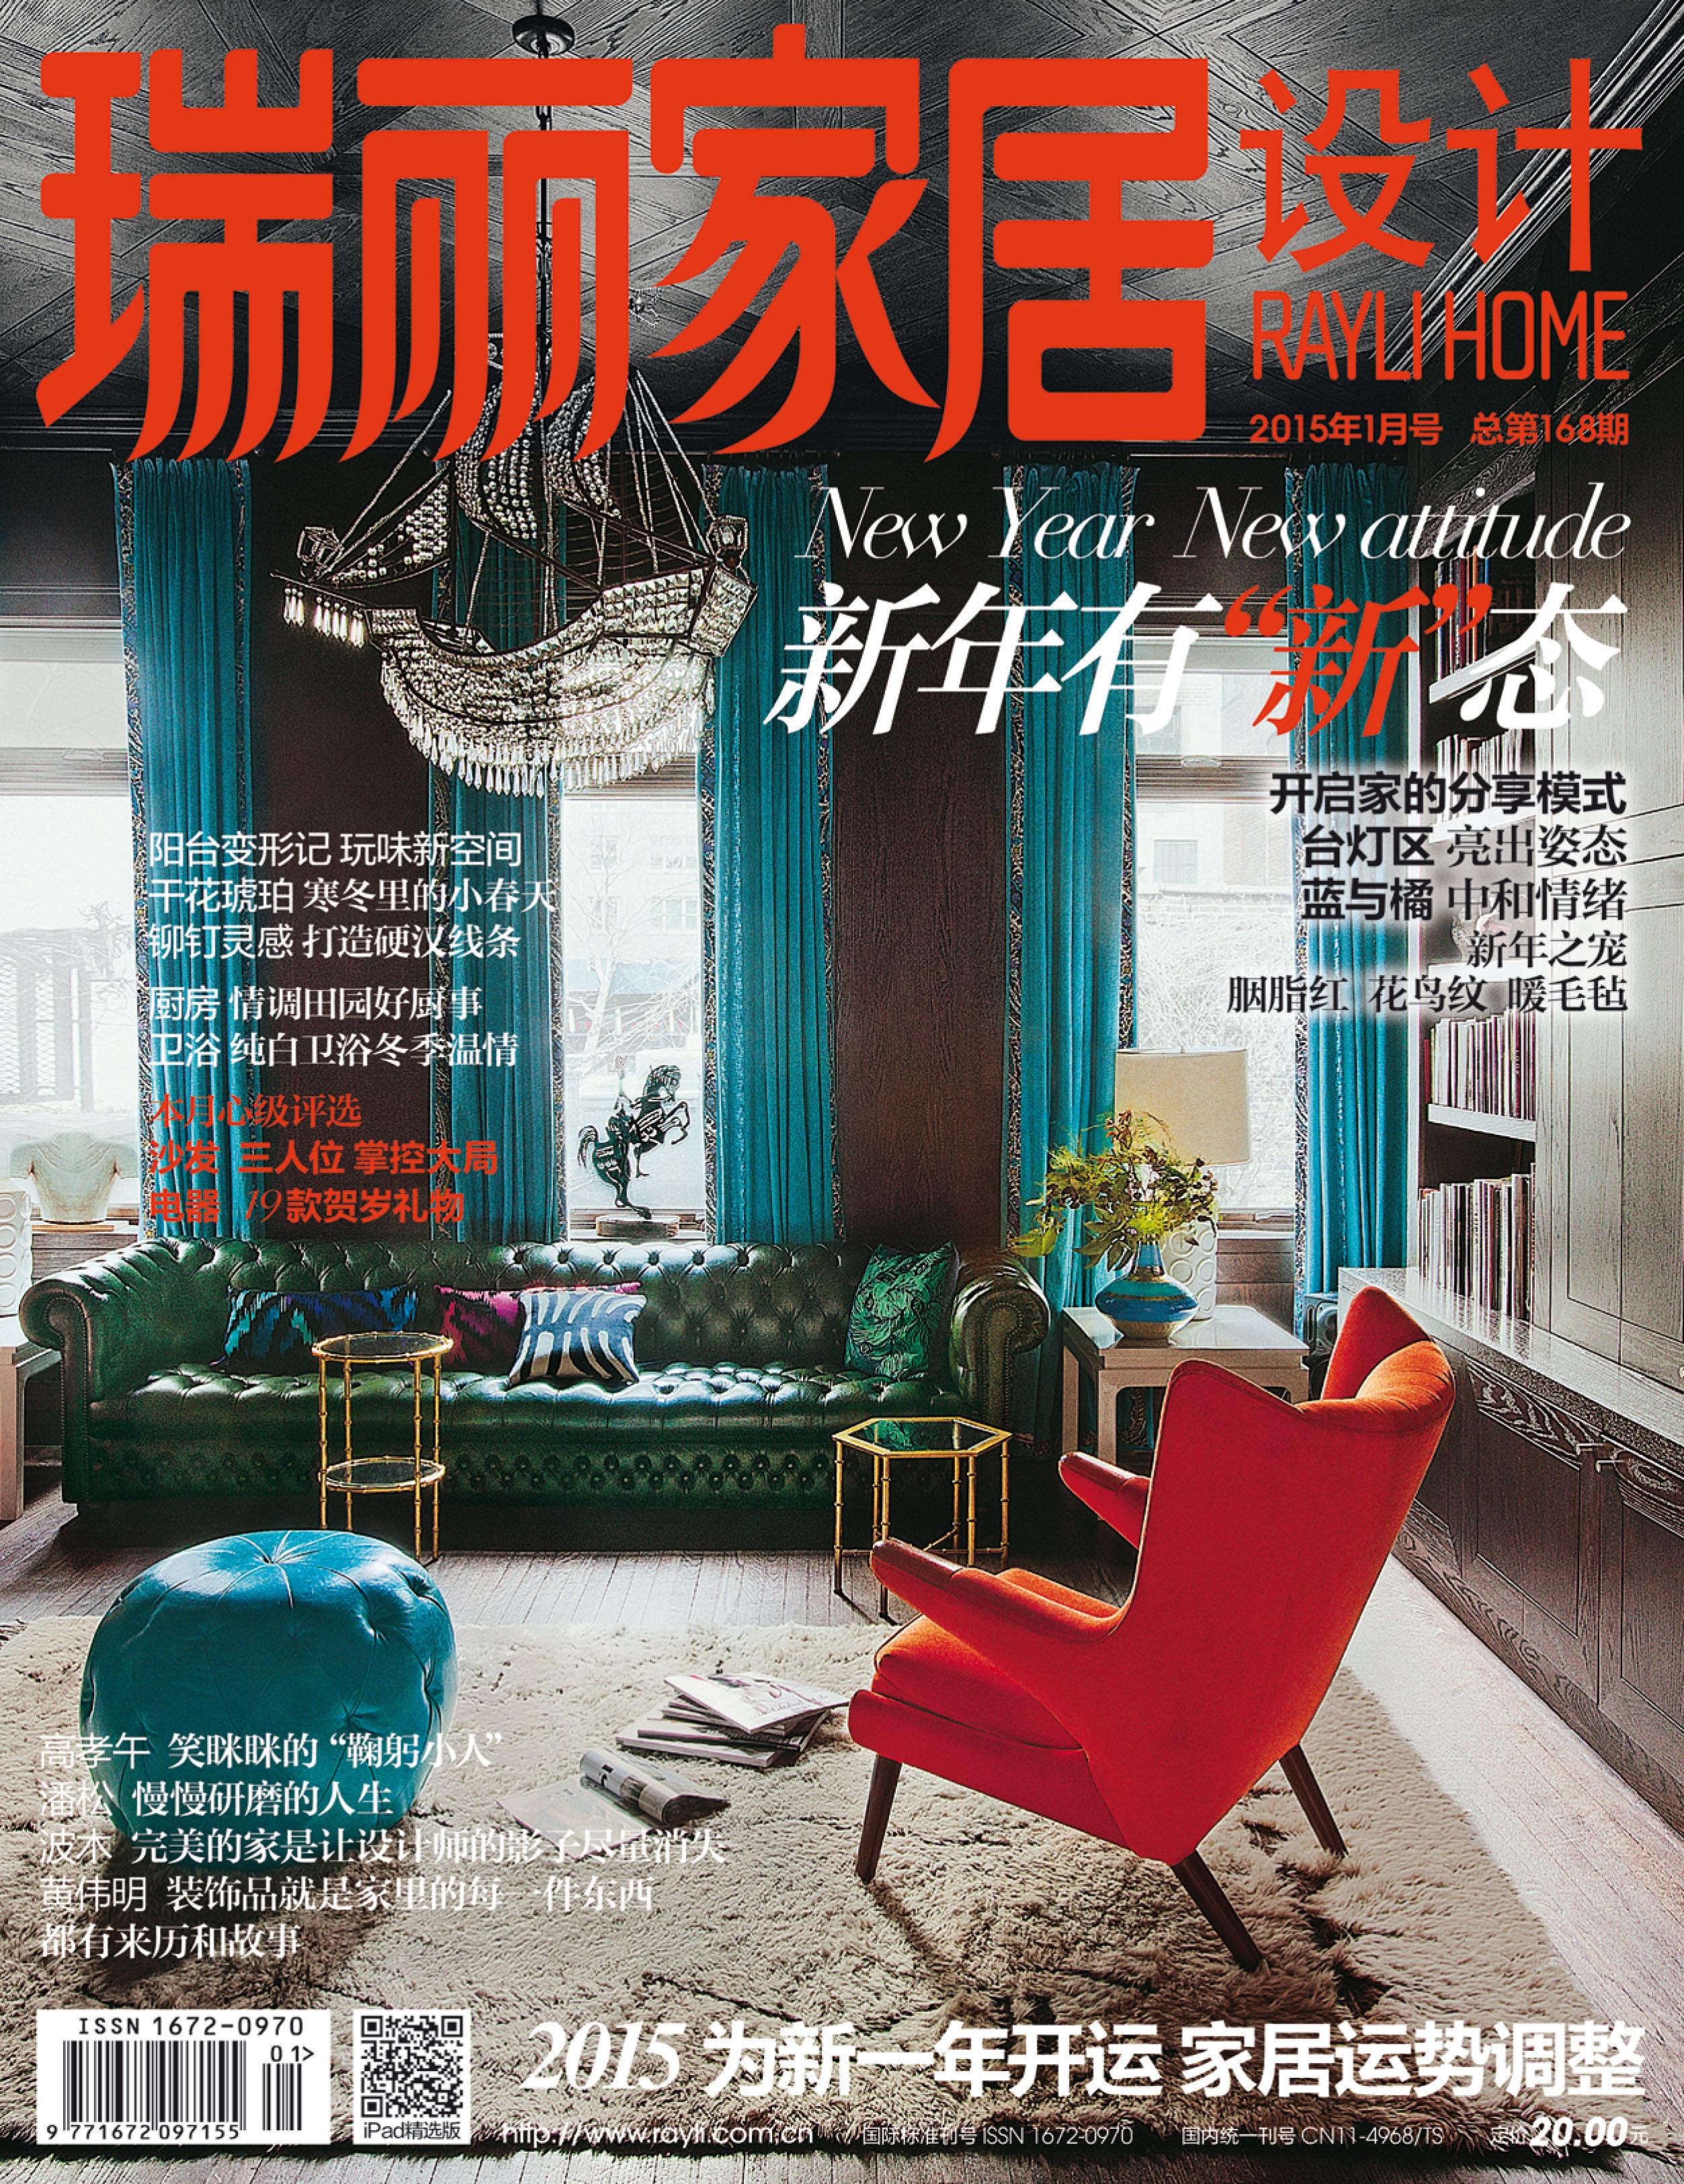 RAYLI-HOME-CHINE-DEC-2014-11 Presse